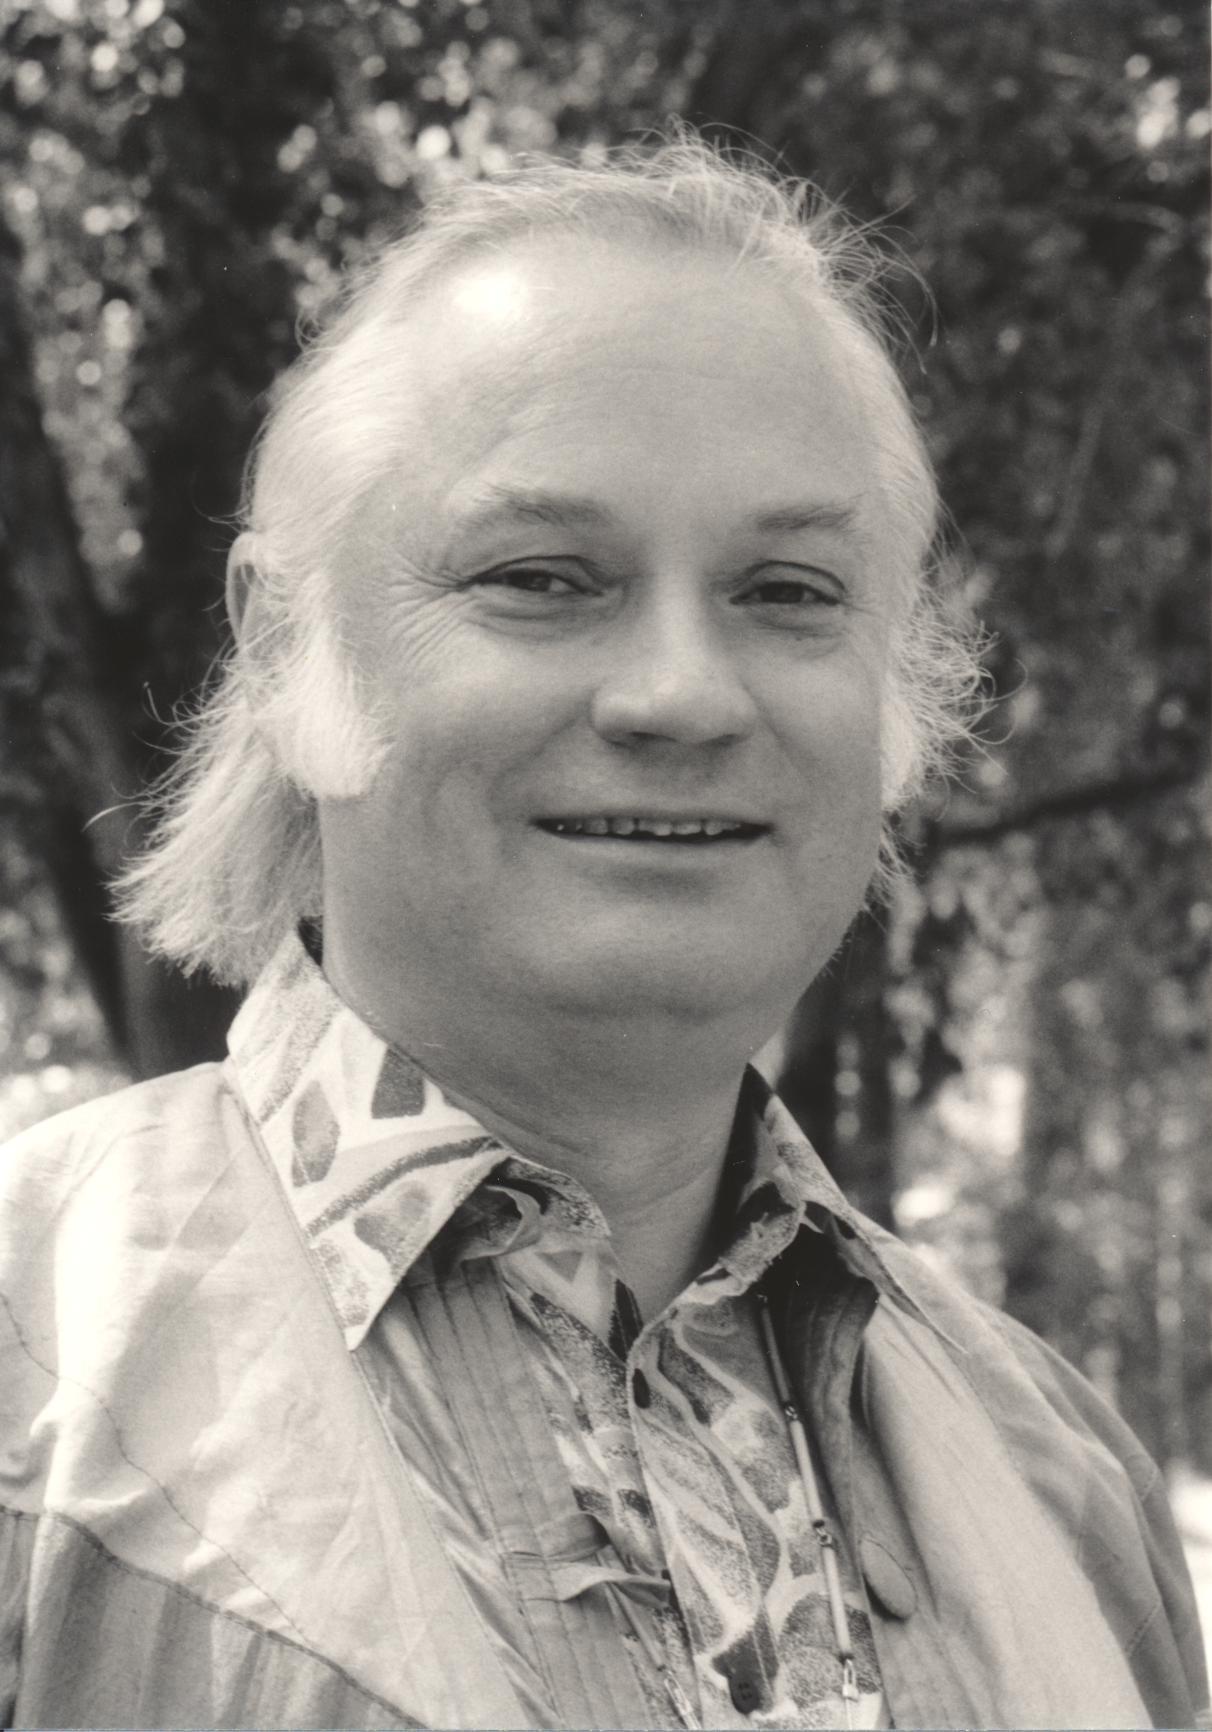 XIV. Imago Mundi-Kongress 1993, Innsbruck, Prof. Manfred Kage